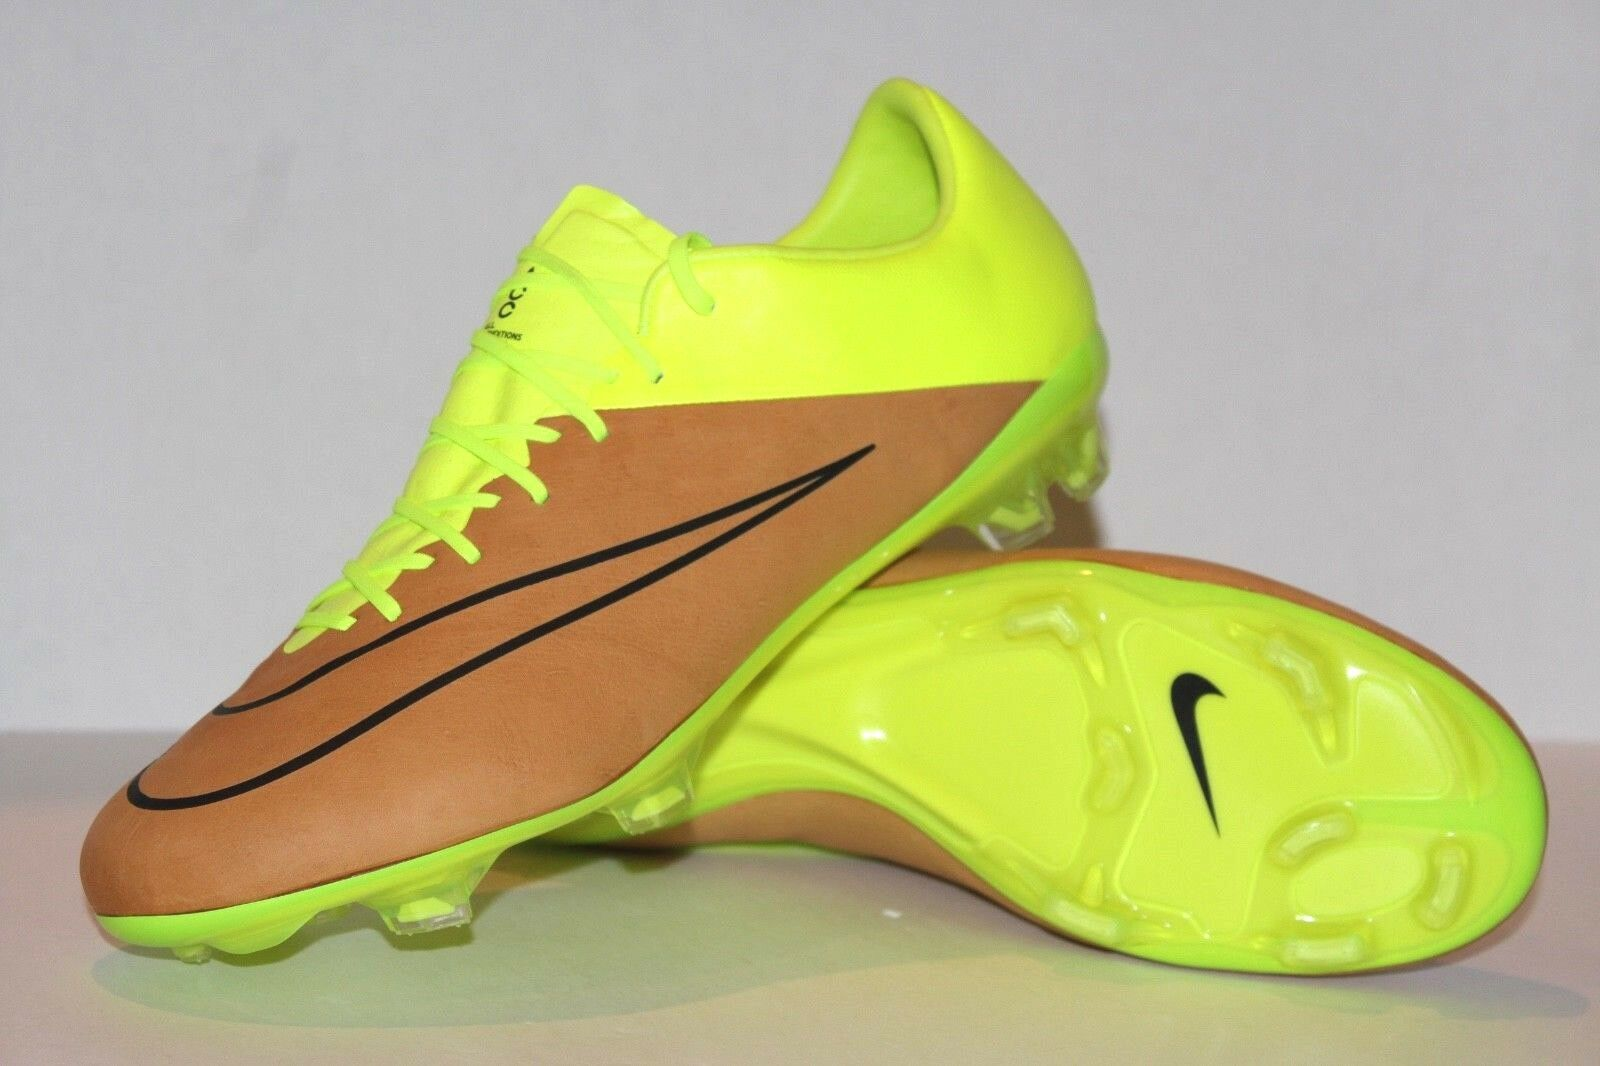 pala Desbordamiento Generoso  Nike Mercurial Vapor X Leather FG Mens Soccer Cleats 10.5 Canvas Volt  747565 707 for sale online | eBay